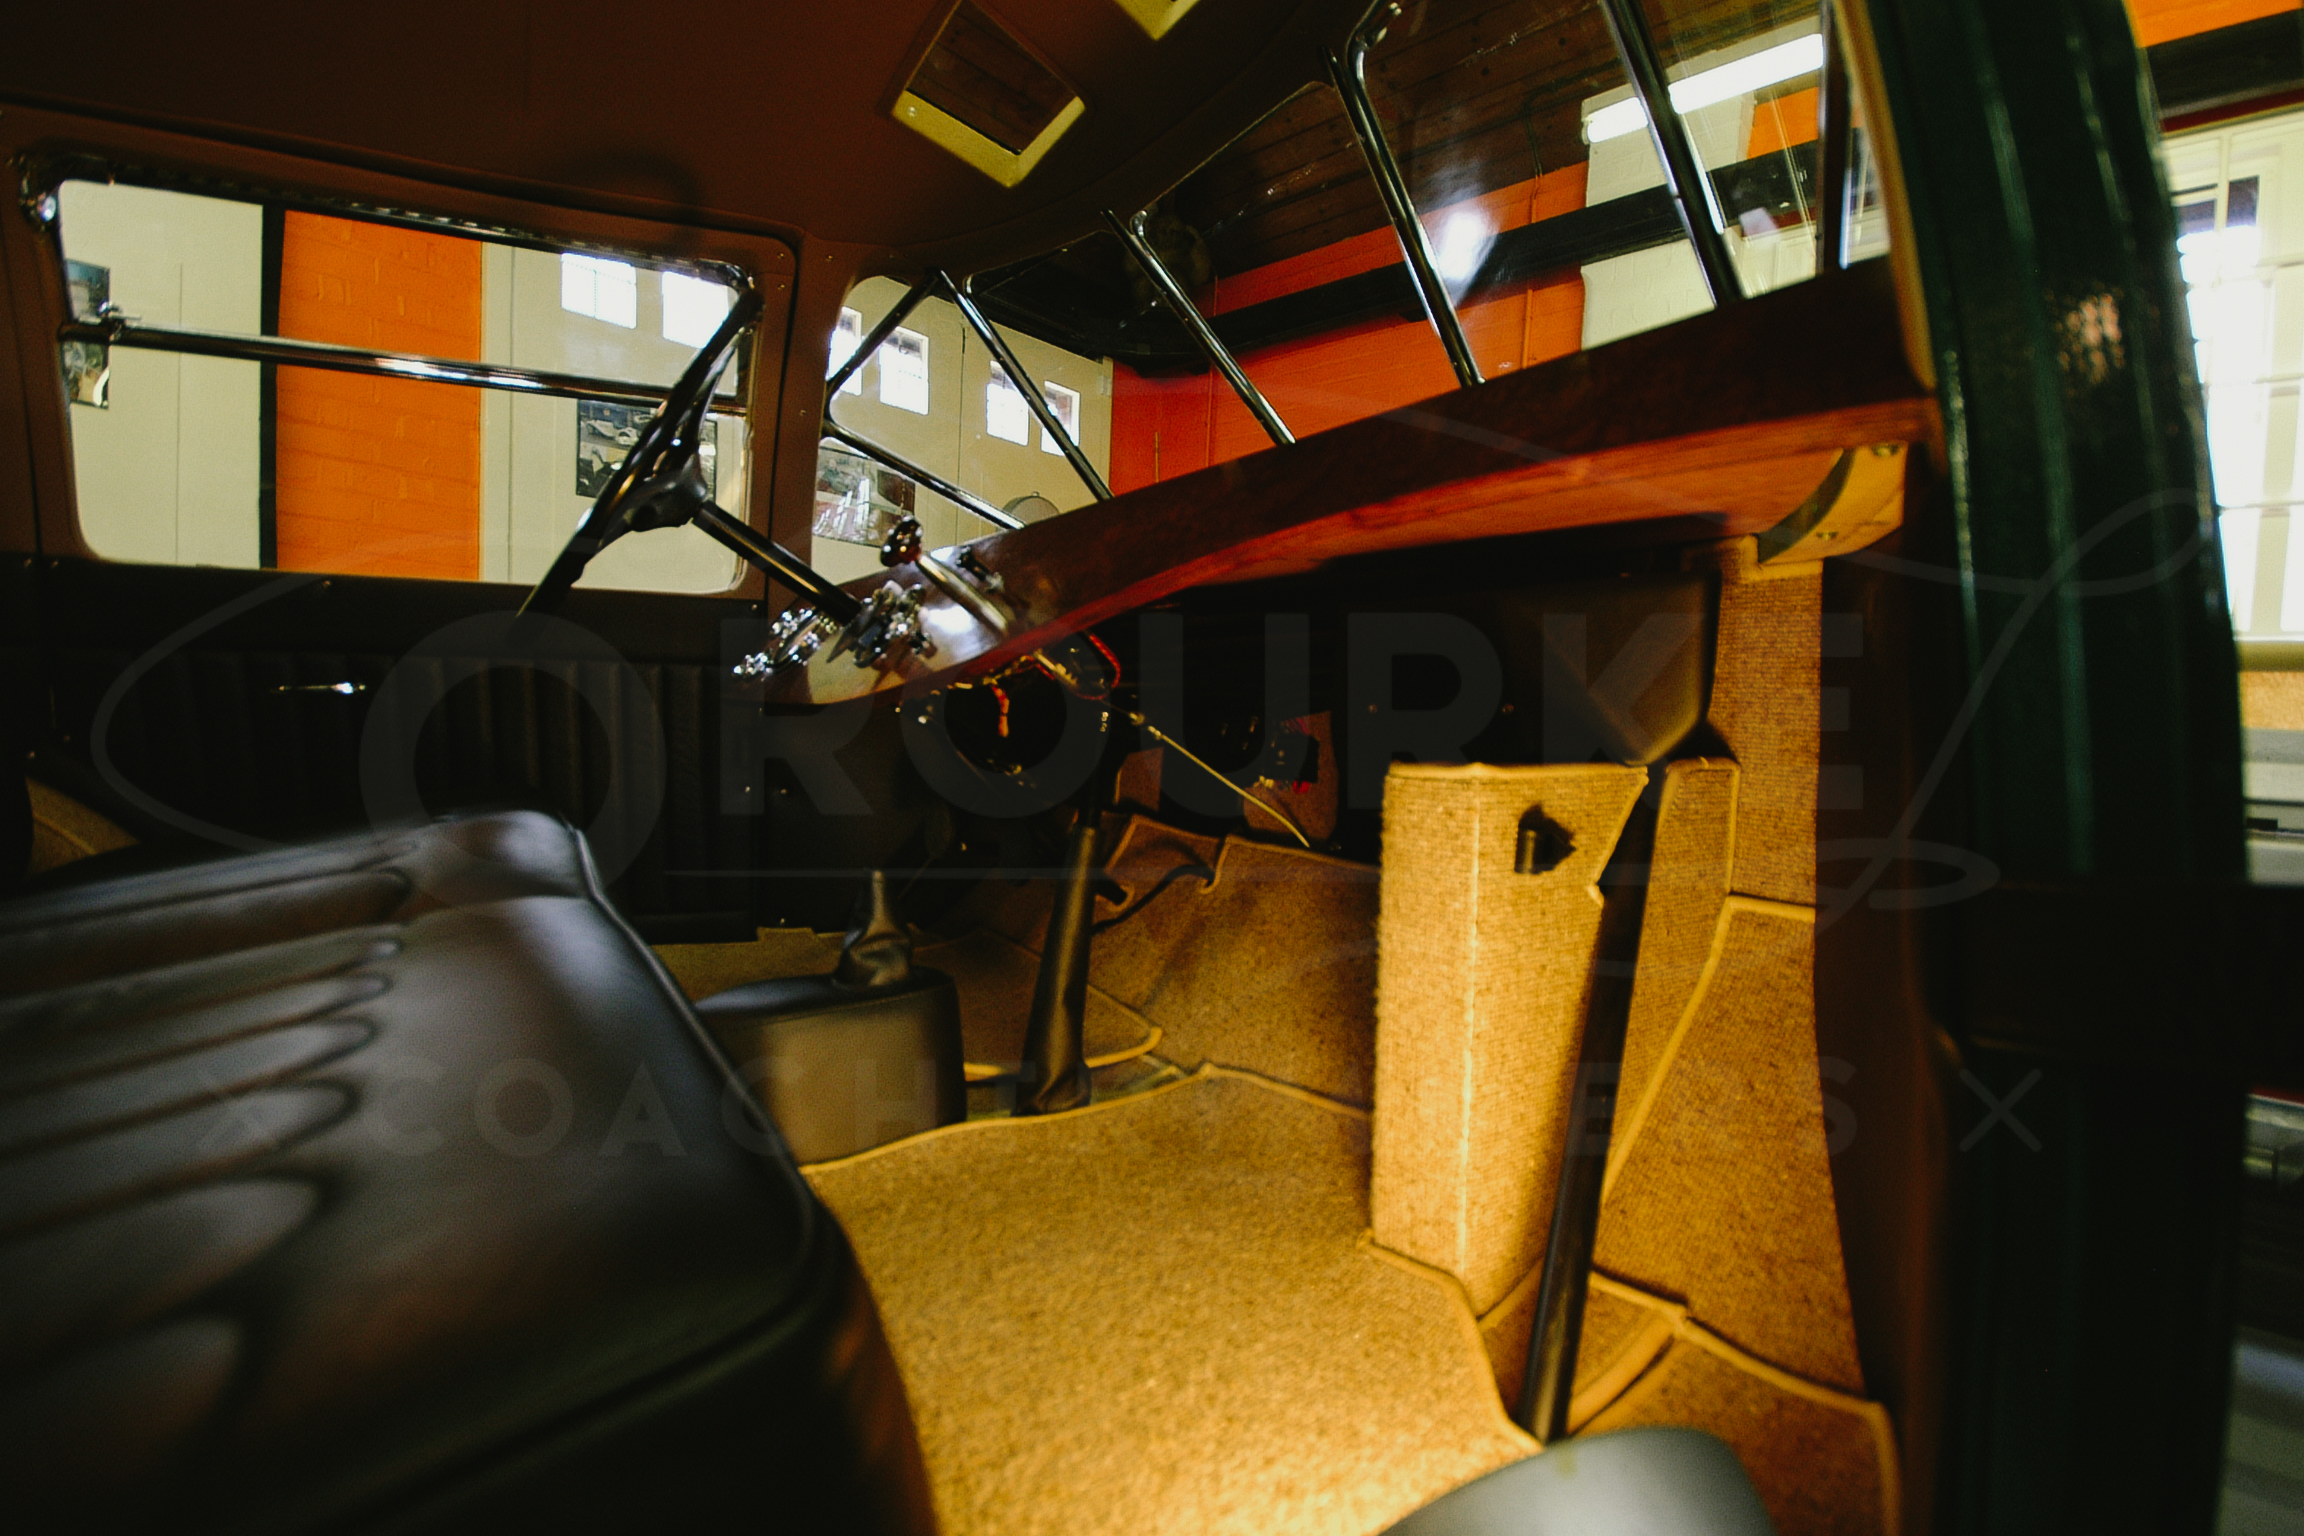 o-rourke-coachtrimmers-dymaxion-car-3-9.jpg